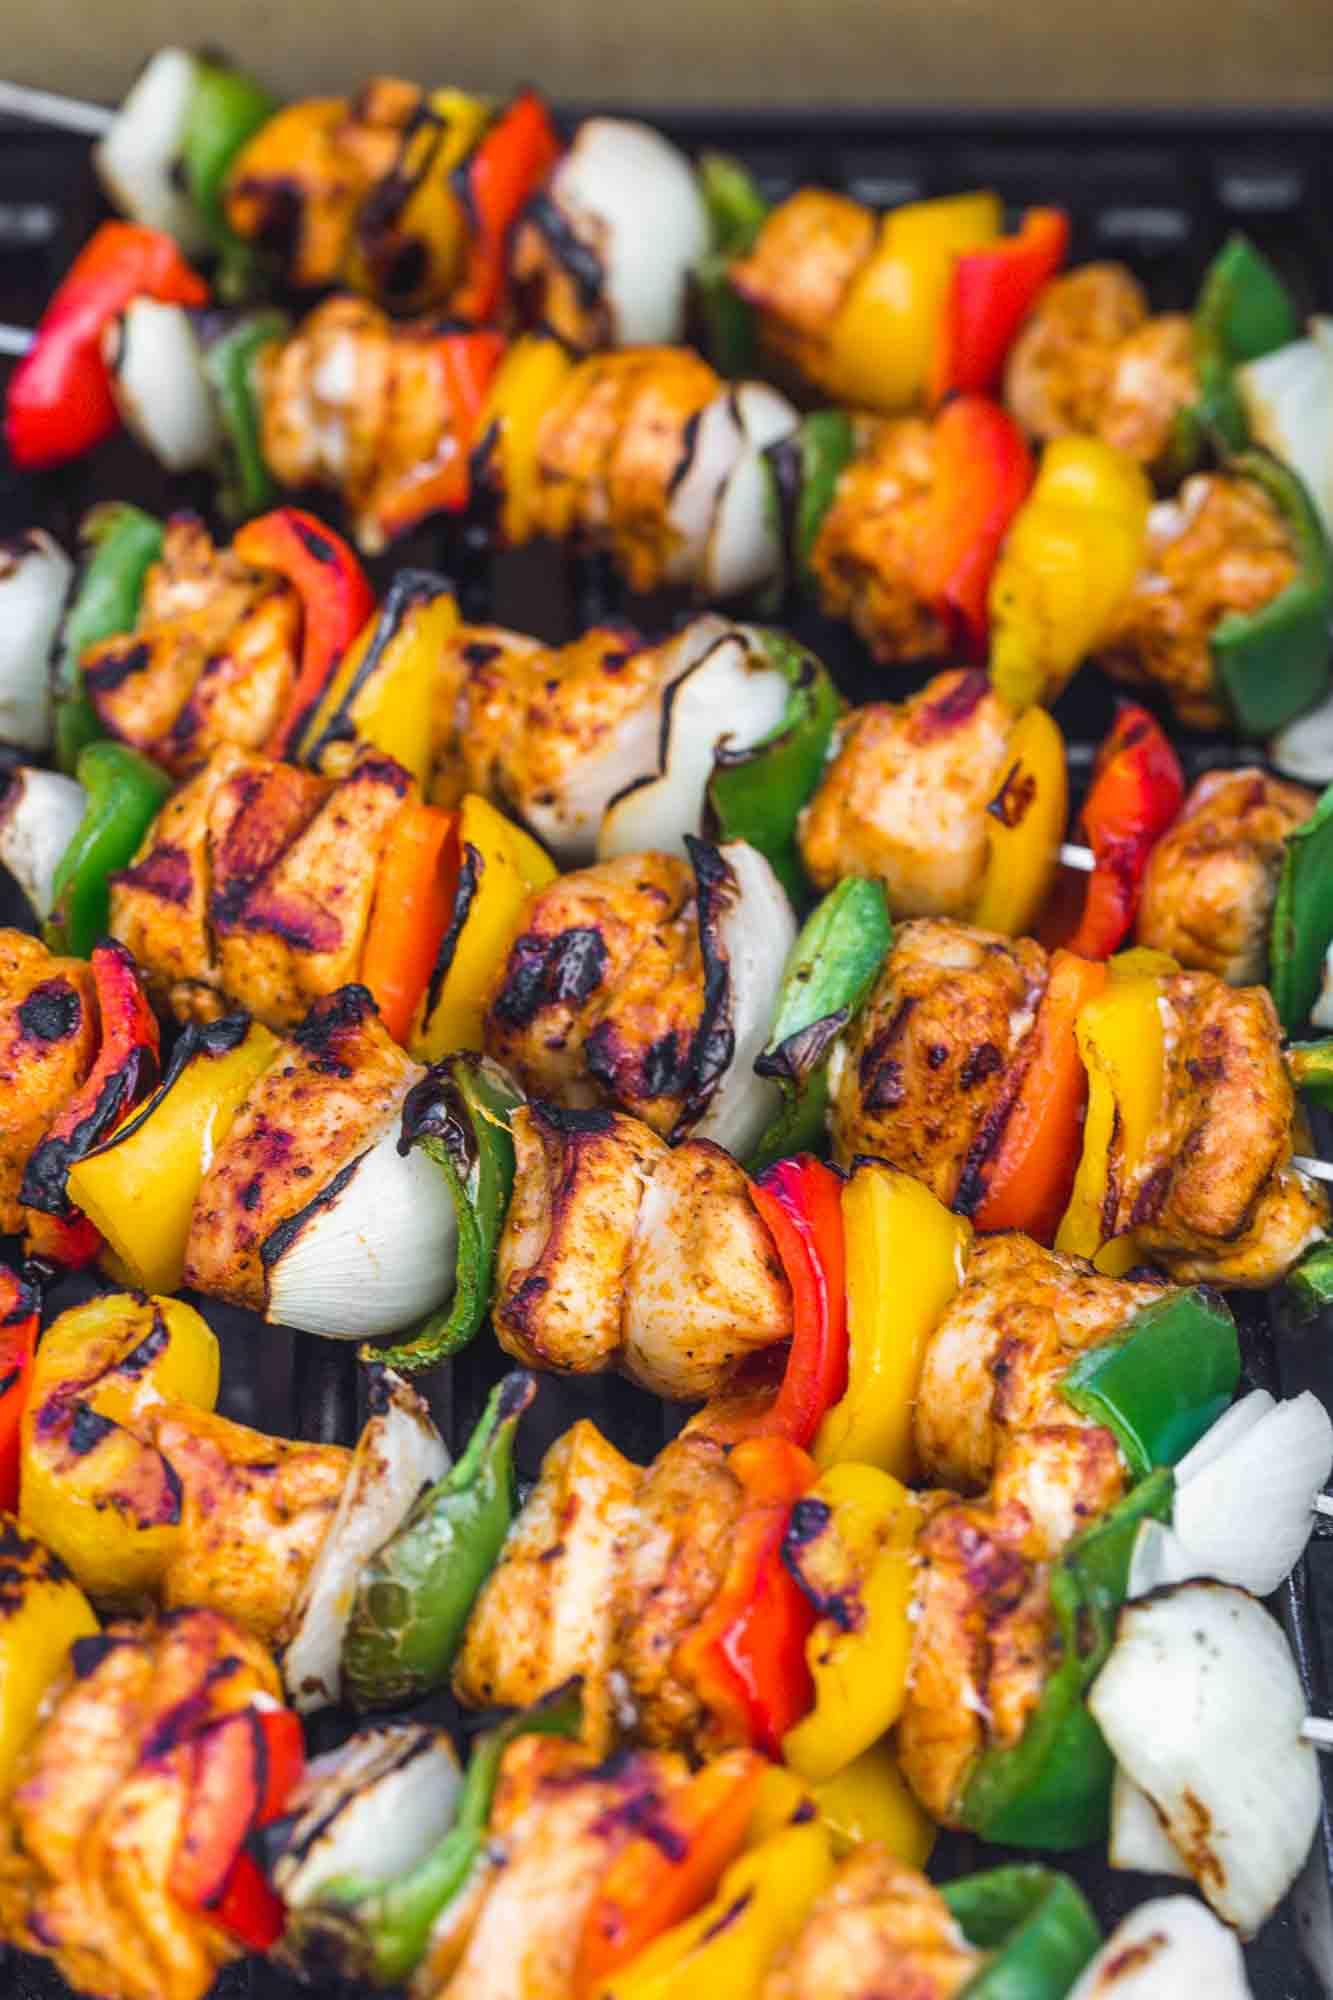 Fajita chicken kebabs on the grill